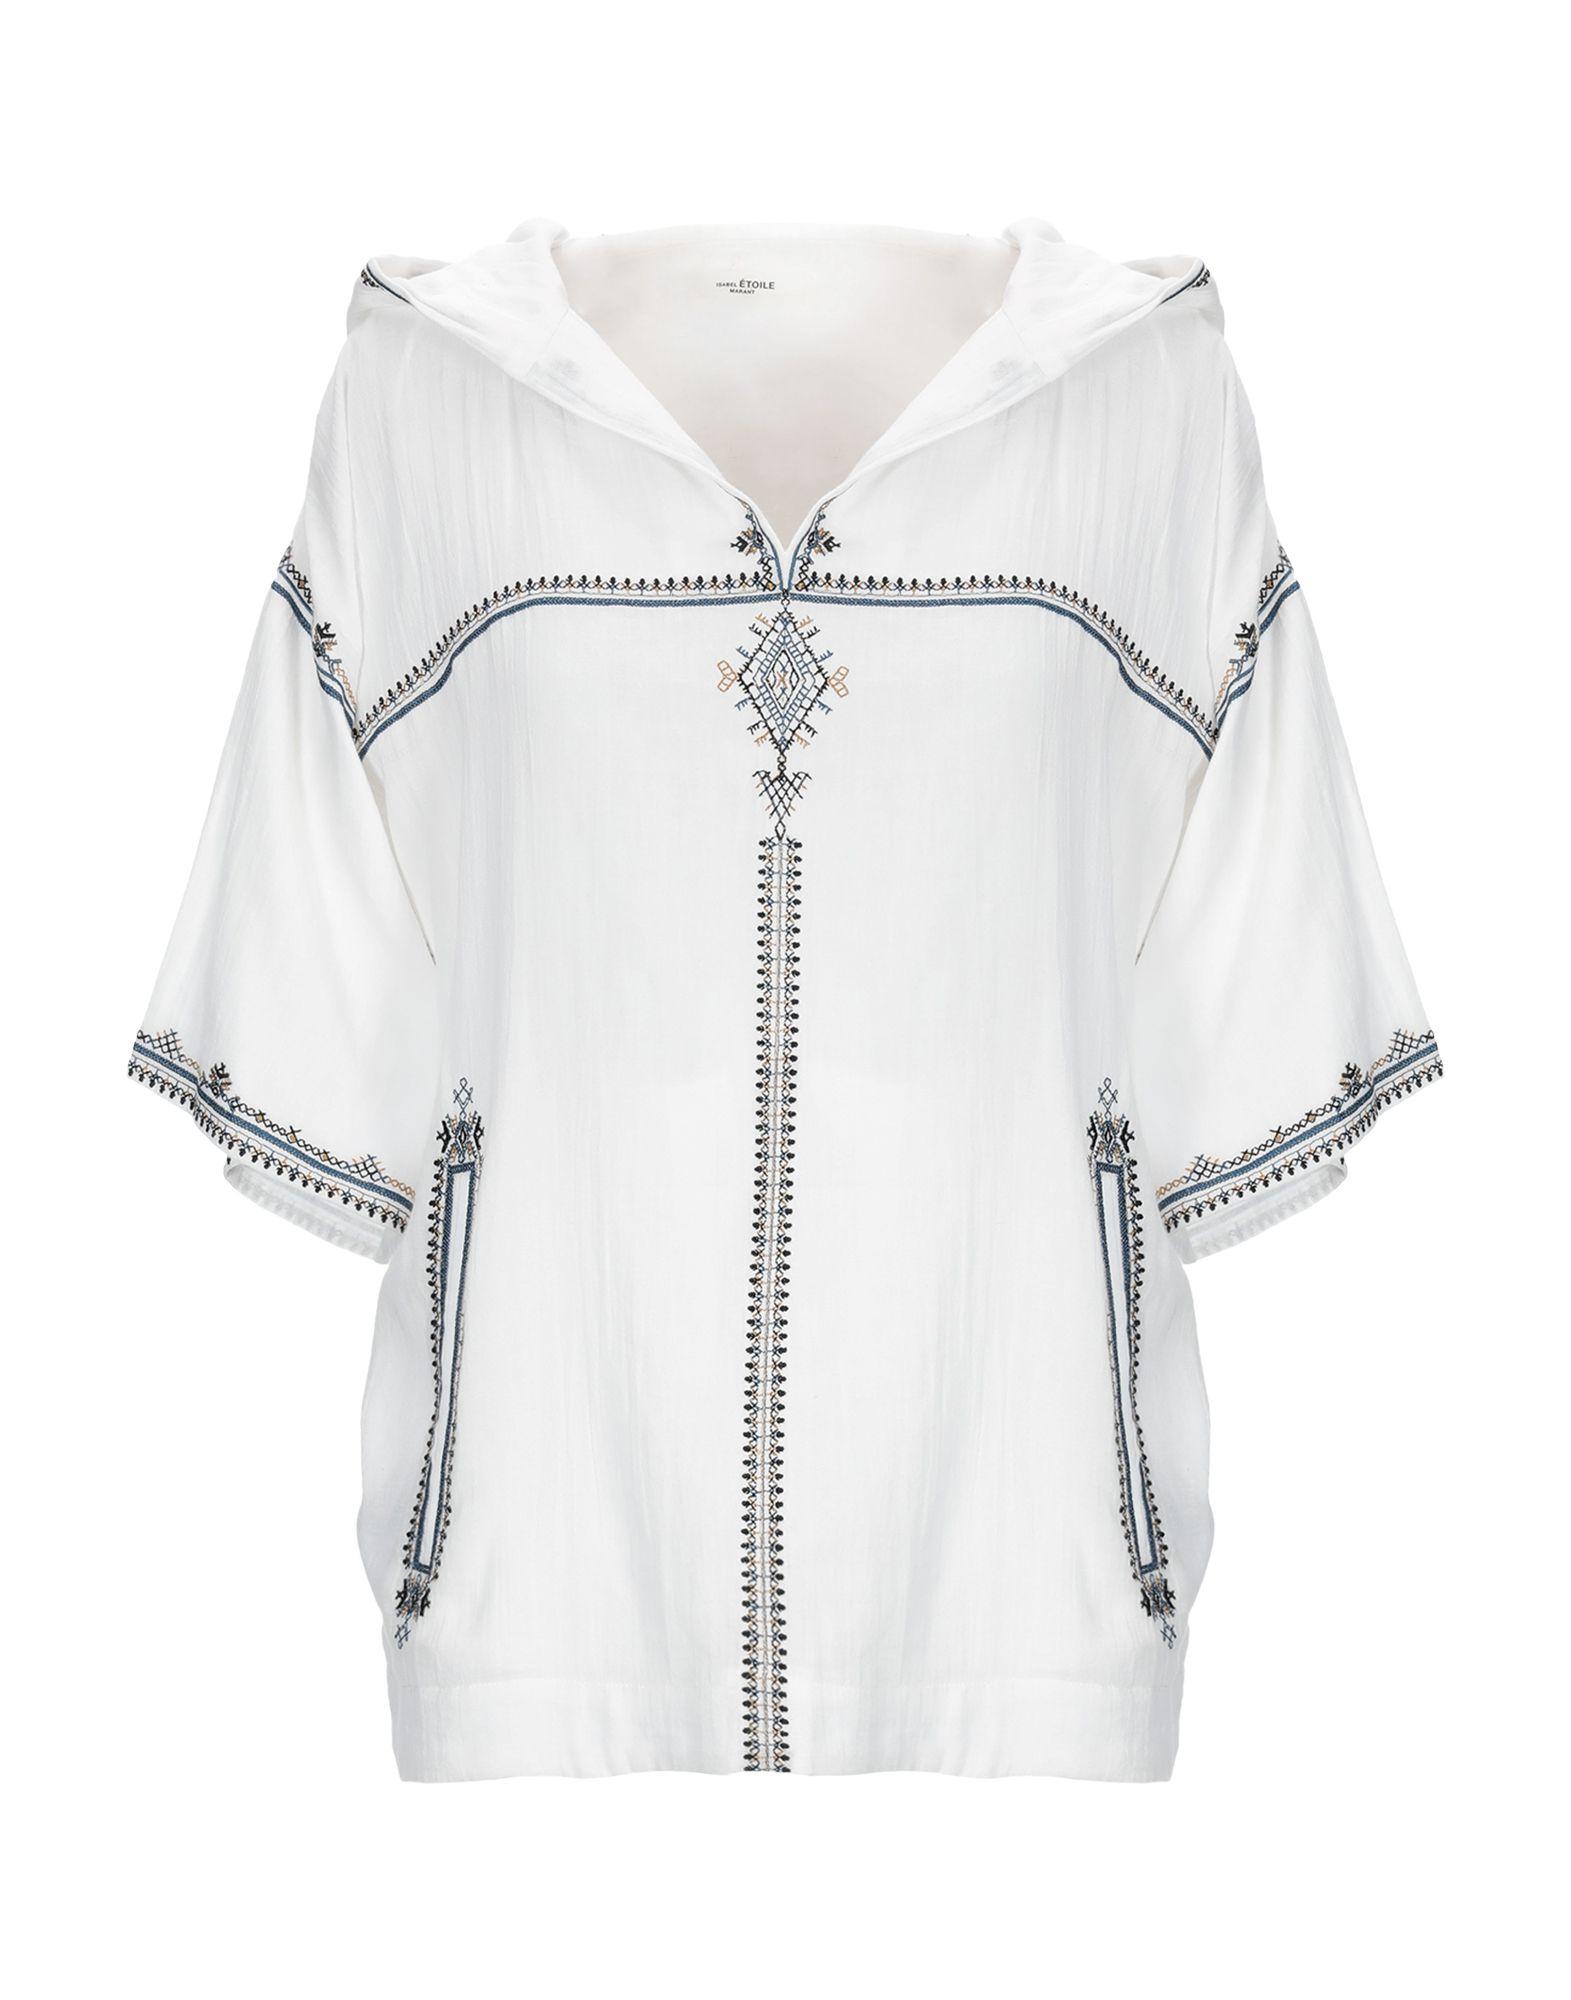 ISABEL MARANT ÉTOILE Блузка isabel marant блузка с кружевом nell